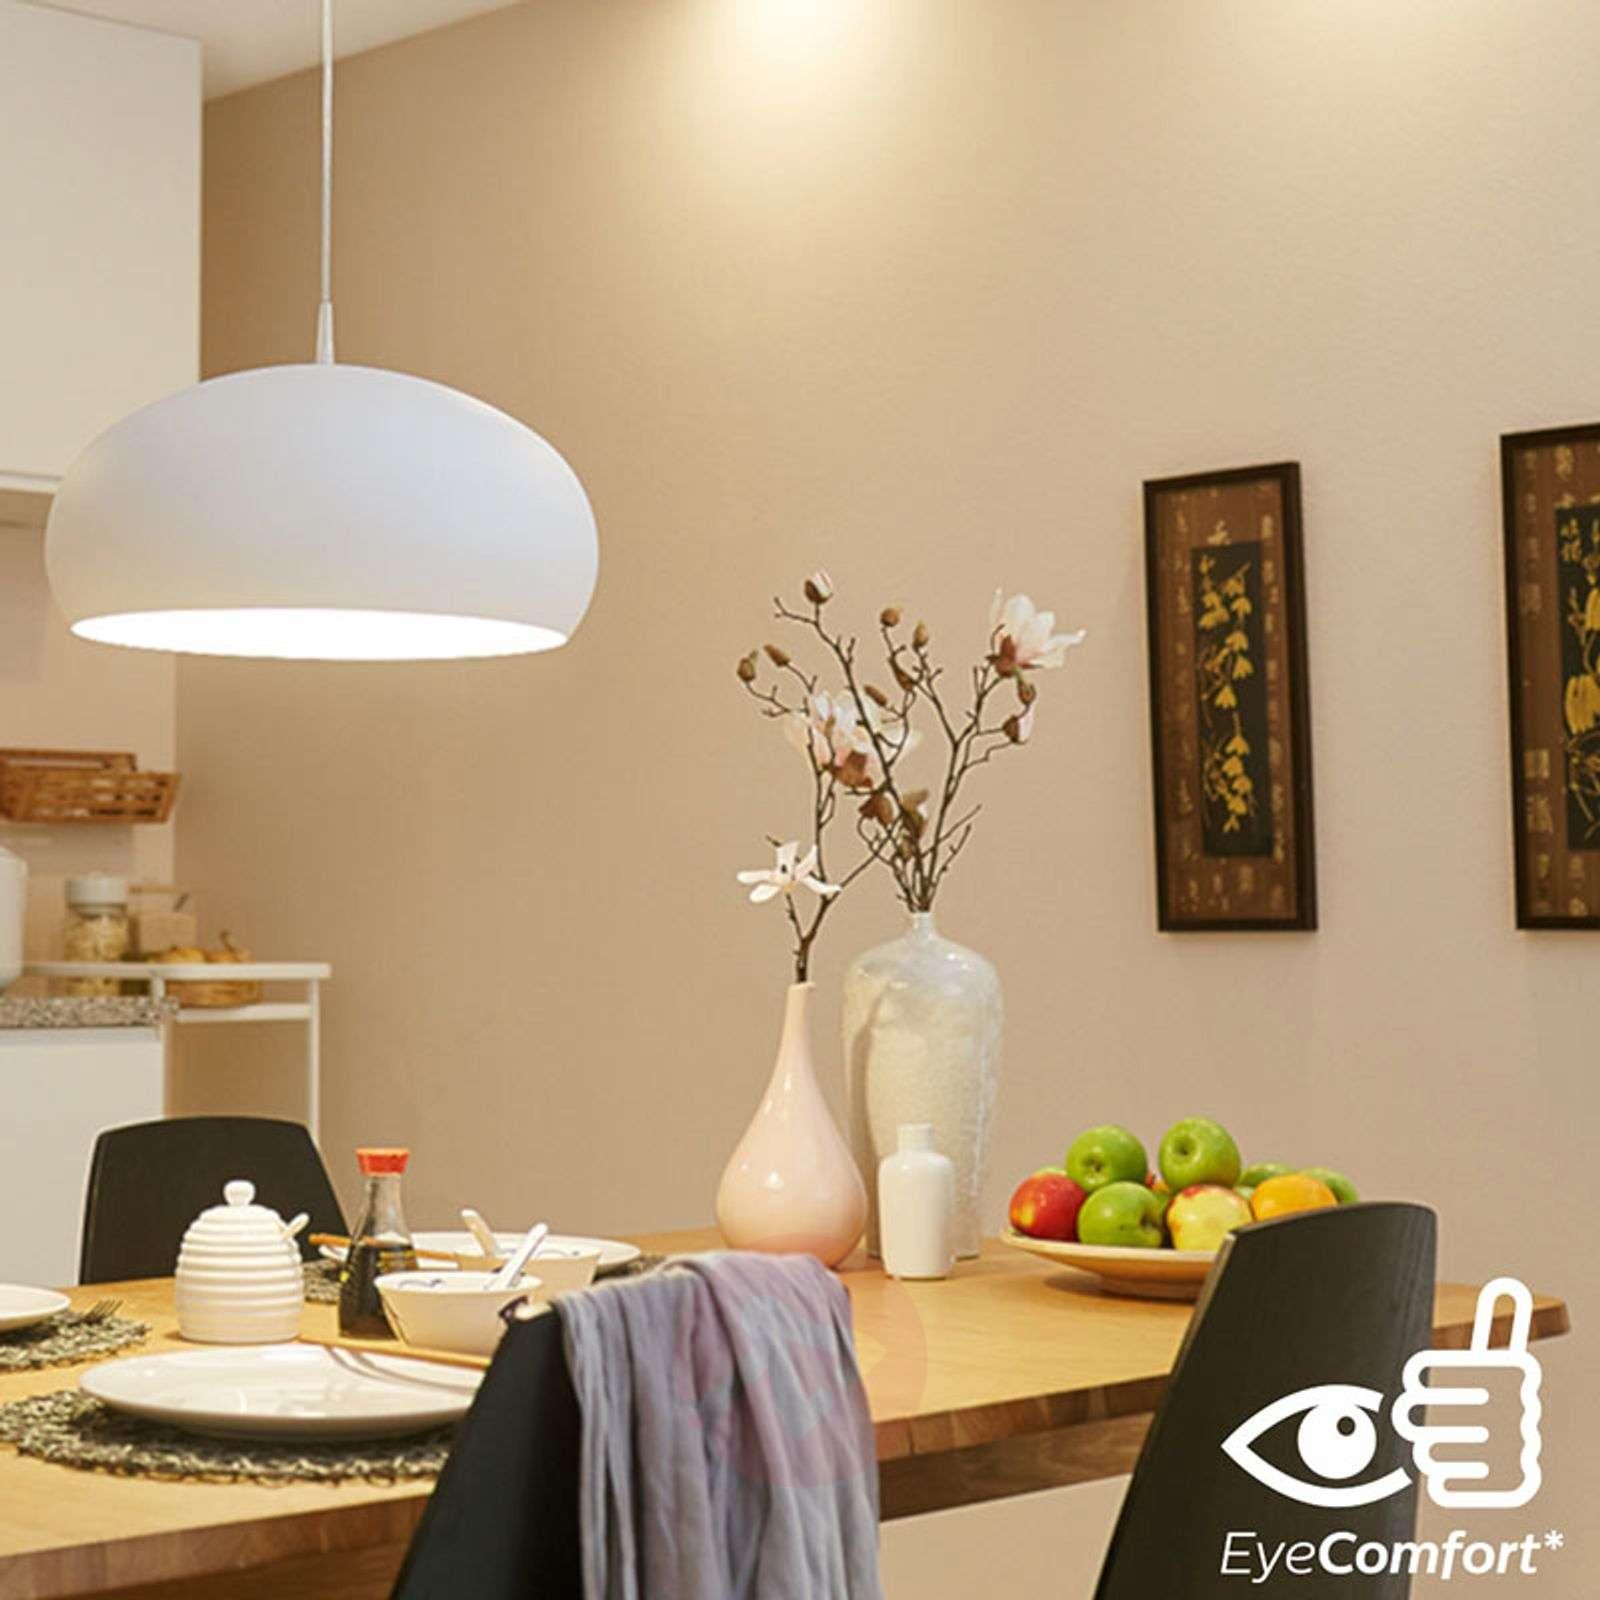 LED-jääkaappilamppu E14 1,7W läm.valk. 150 lumenia-7530777-01